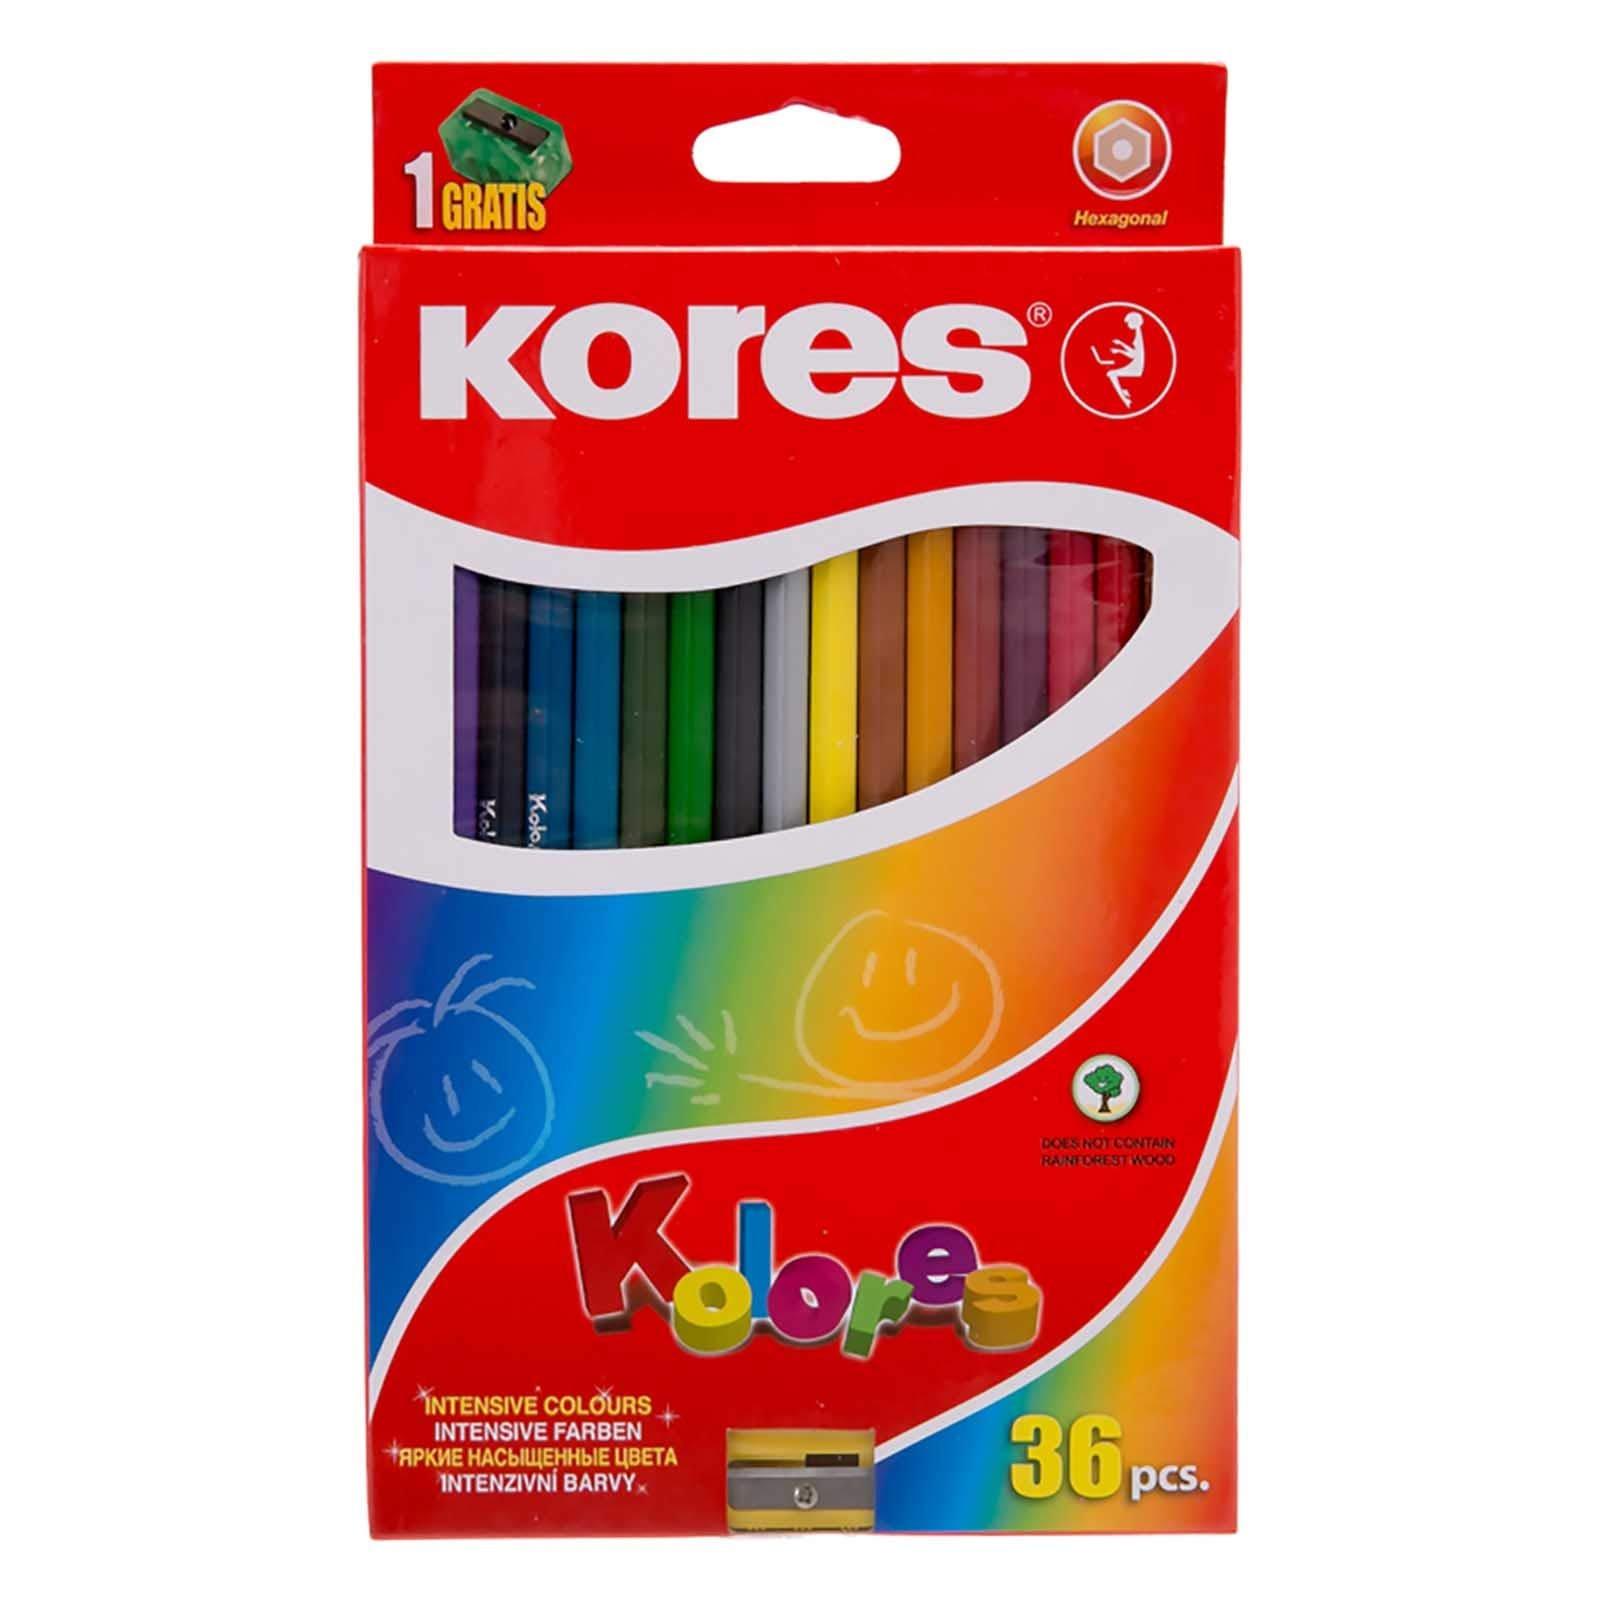 Kores - Kolores Coloured Pencils (96336)